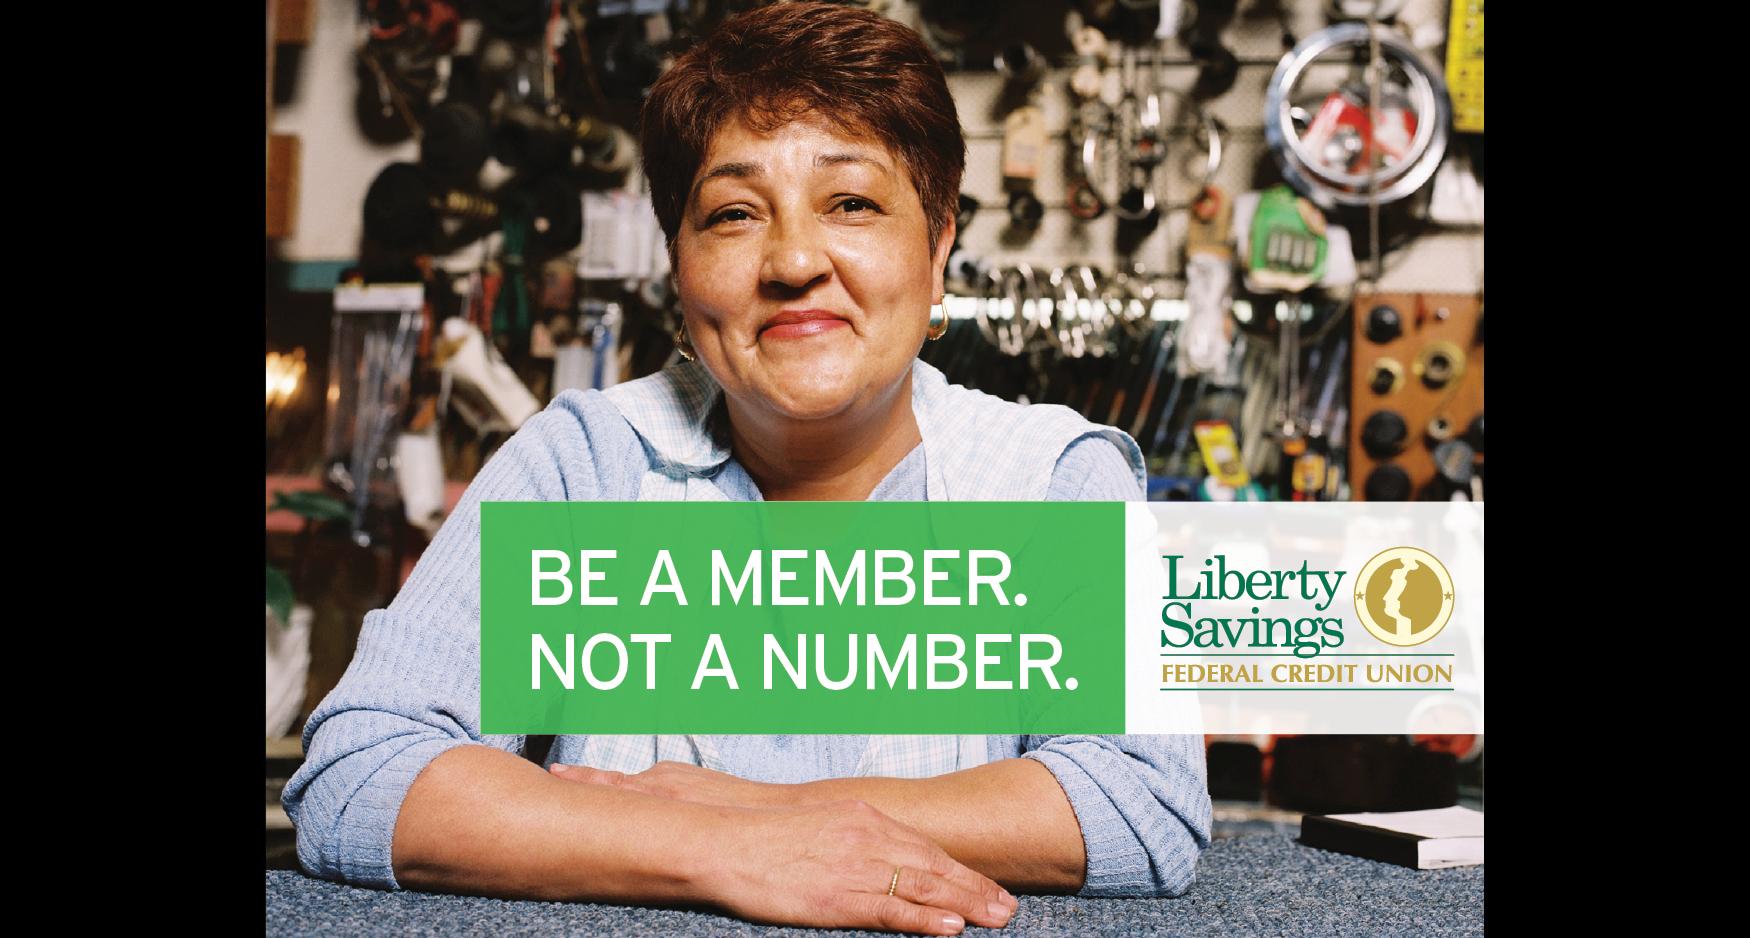 BP Large Website Images16 - LIBERTY SAVINGS - NEIGHBORHOOD SPIRIT CAMPAIGN